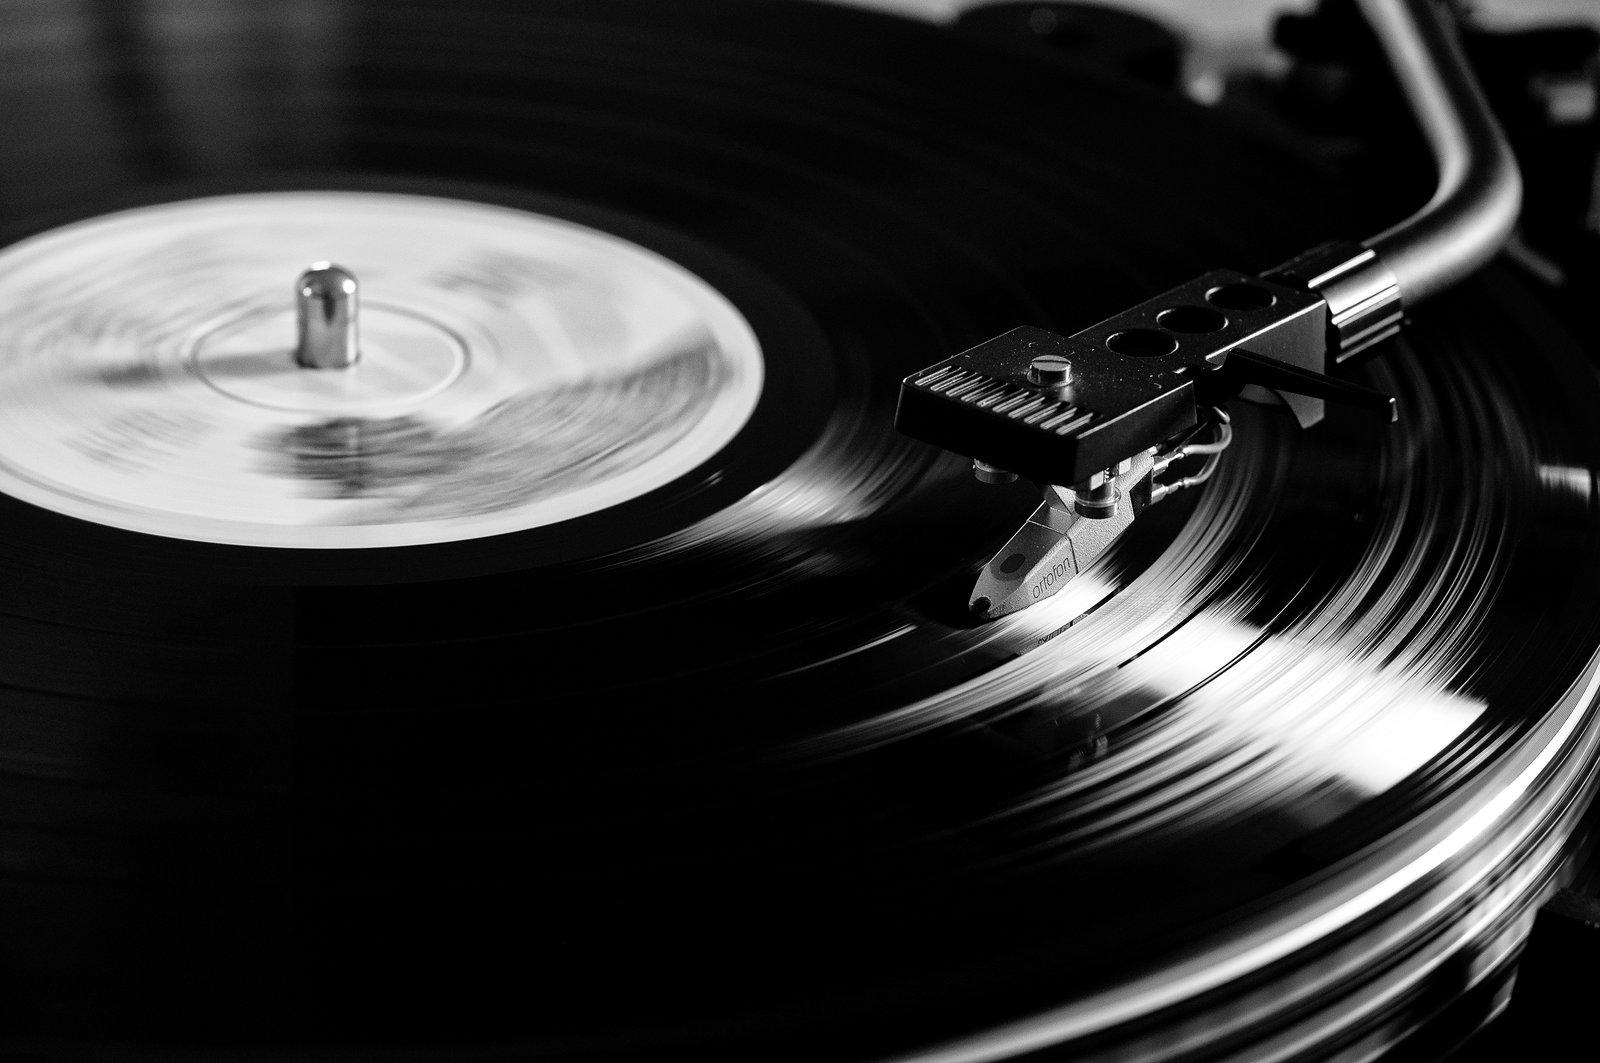 https://www.imoveilive.com/wp-content/uploads/2015/02/Vinyl.jpg